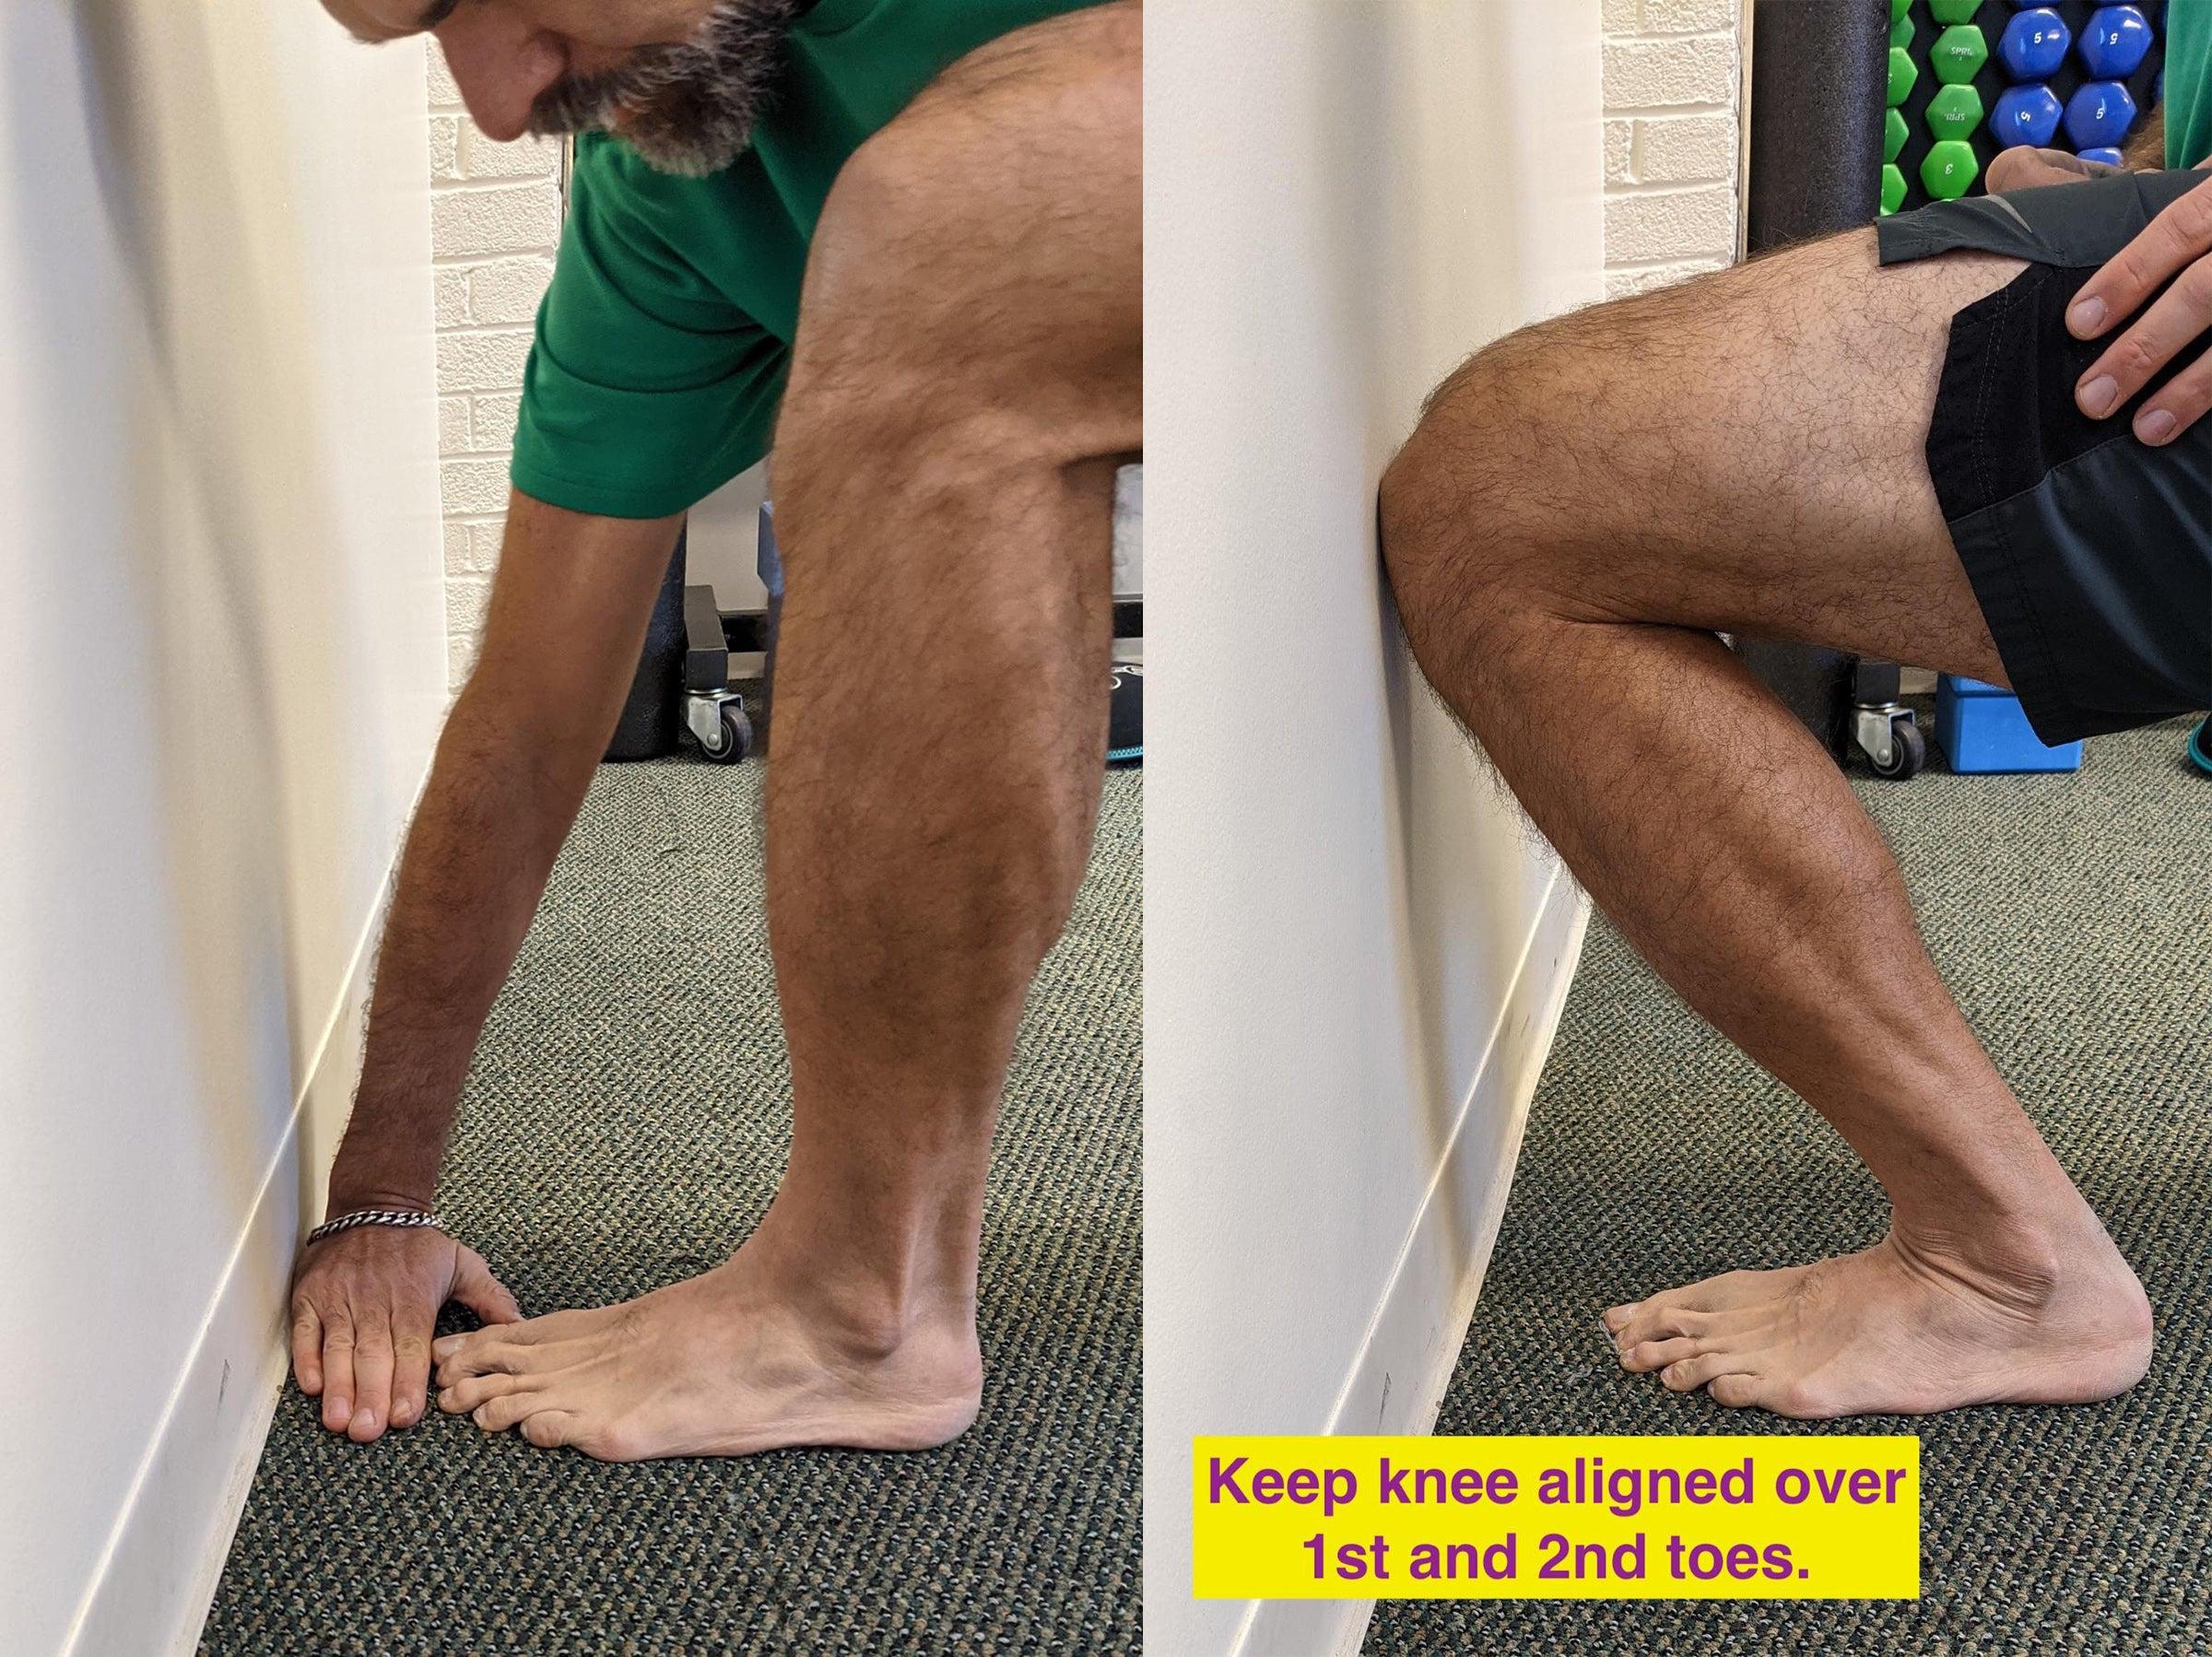 ankle dorsiflexion assessment